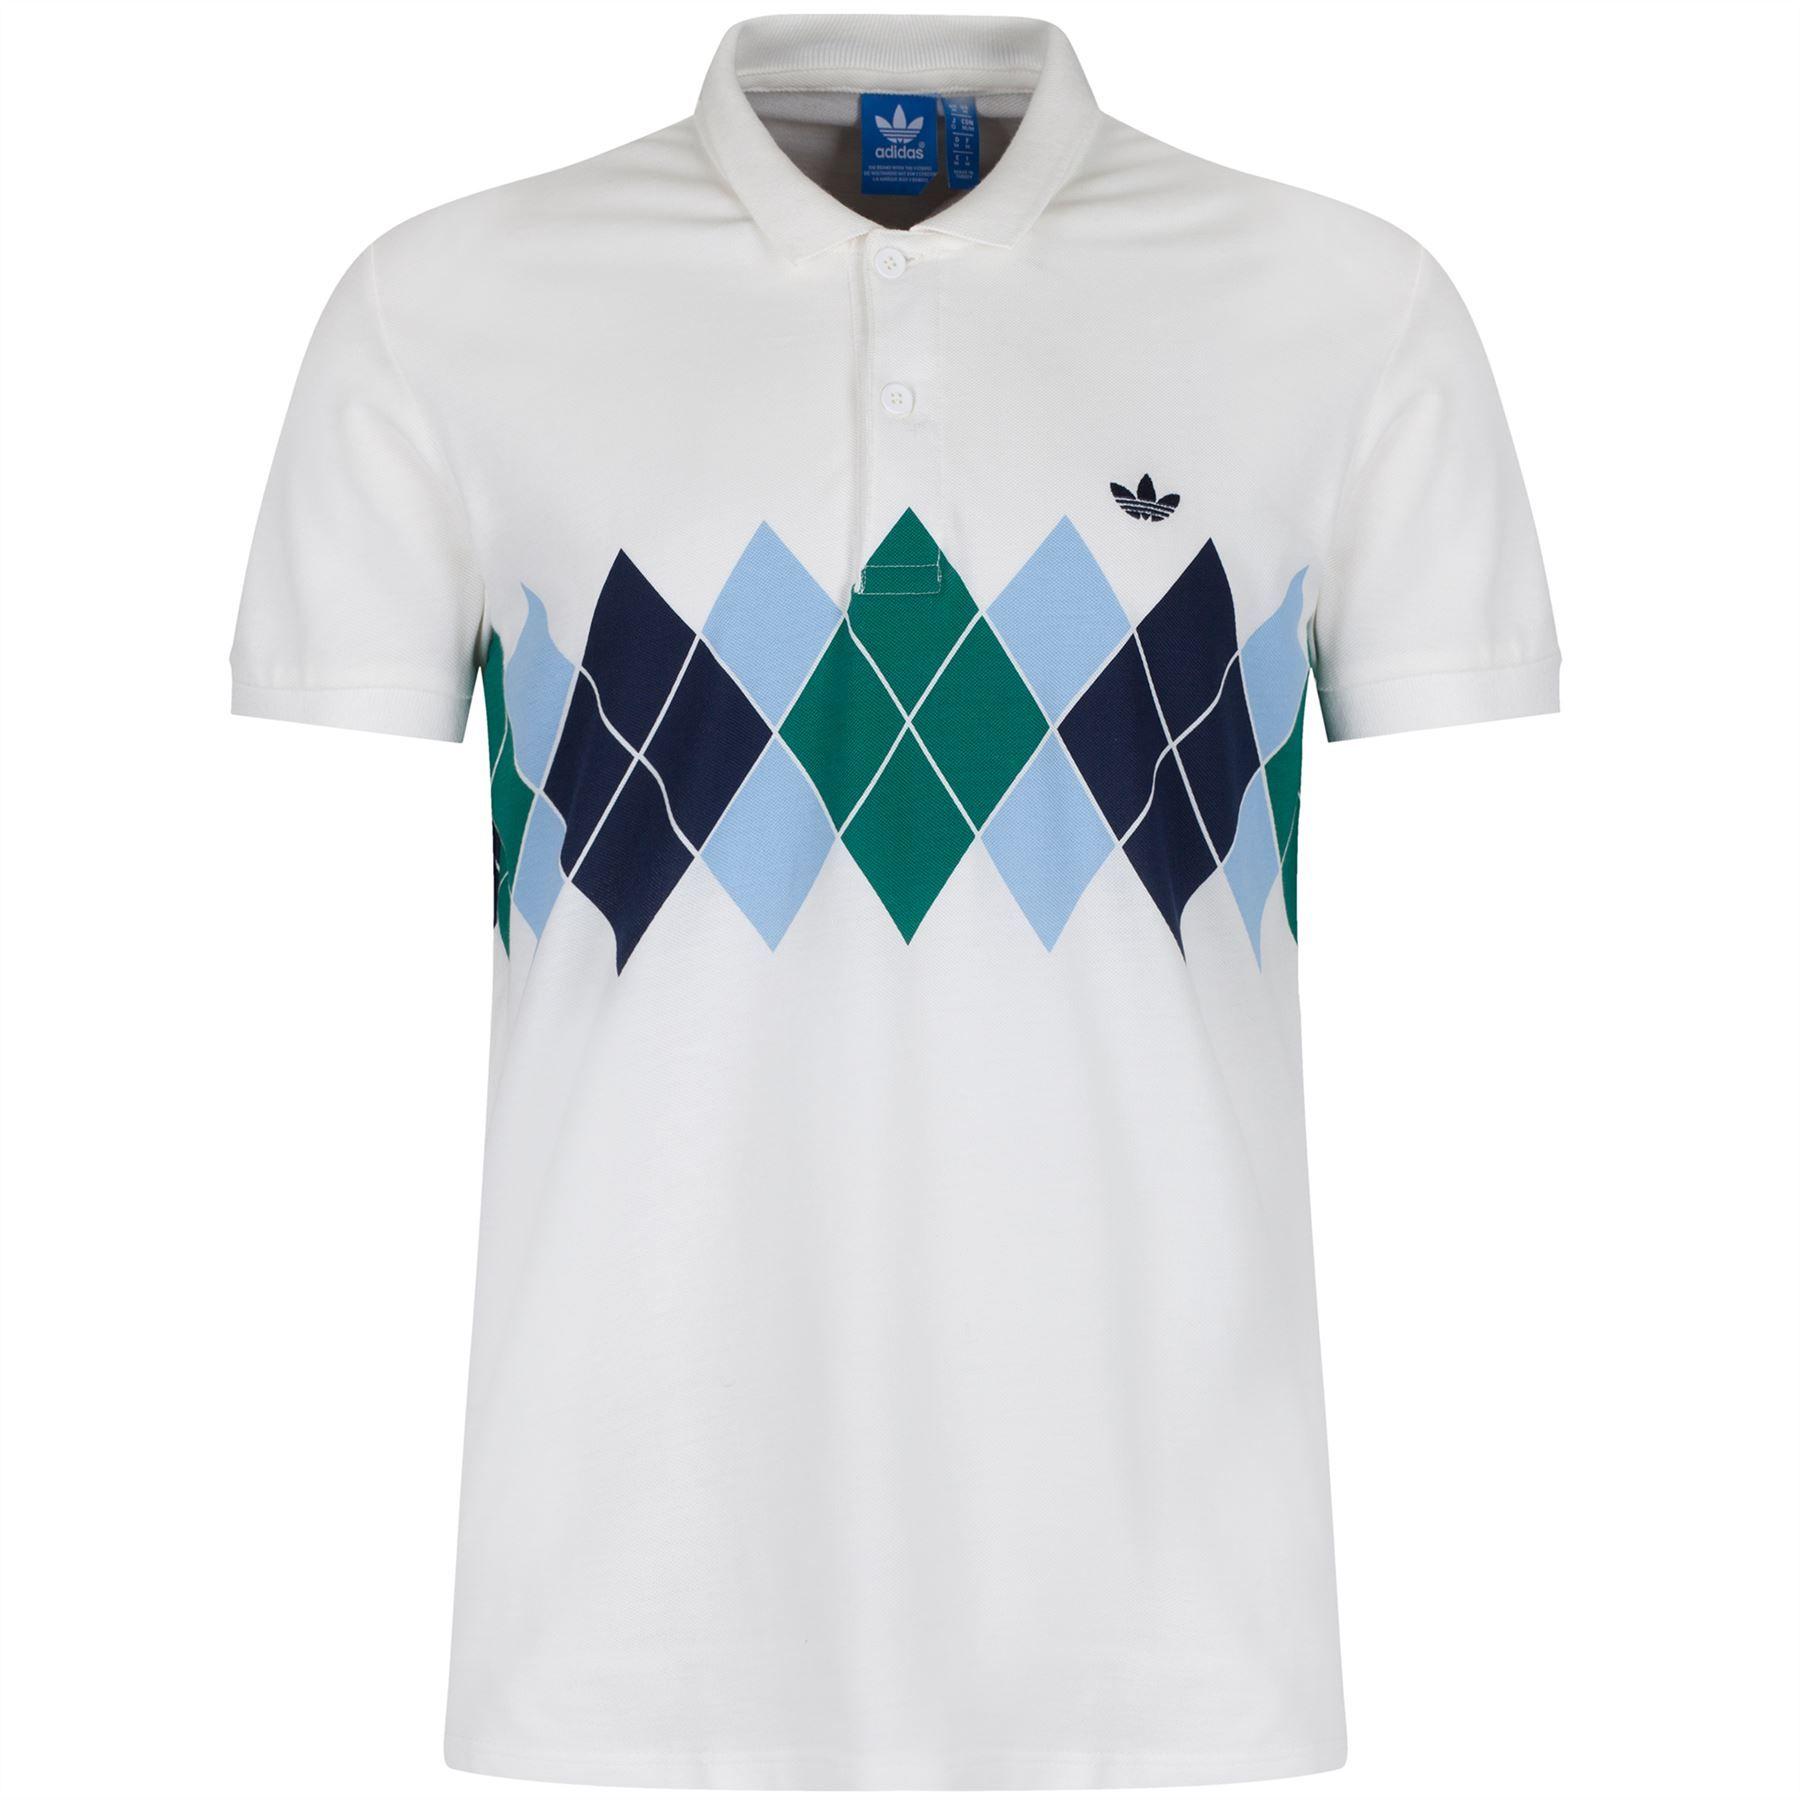 Polo Ivan White B Argyle Shirt Xs Lendl Navy Men's Adidas Originals 0Owvm8Nn